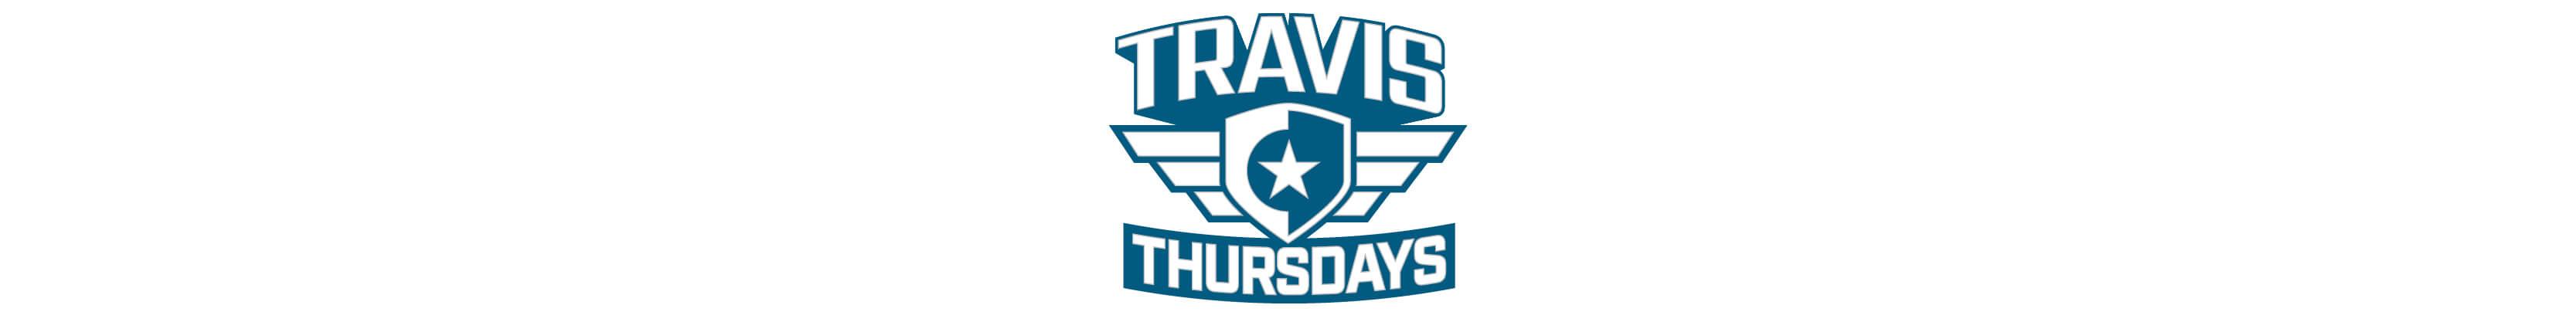 Travis Thursdays at Momentum